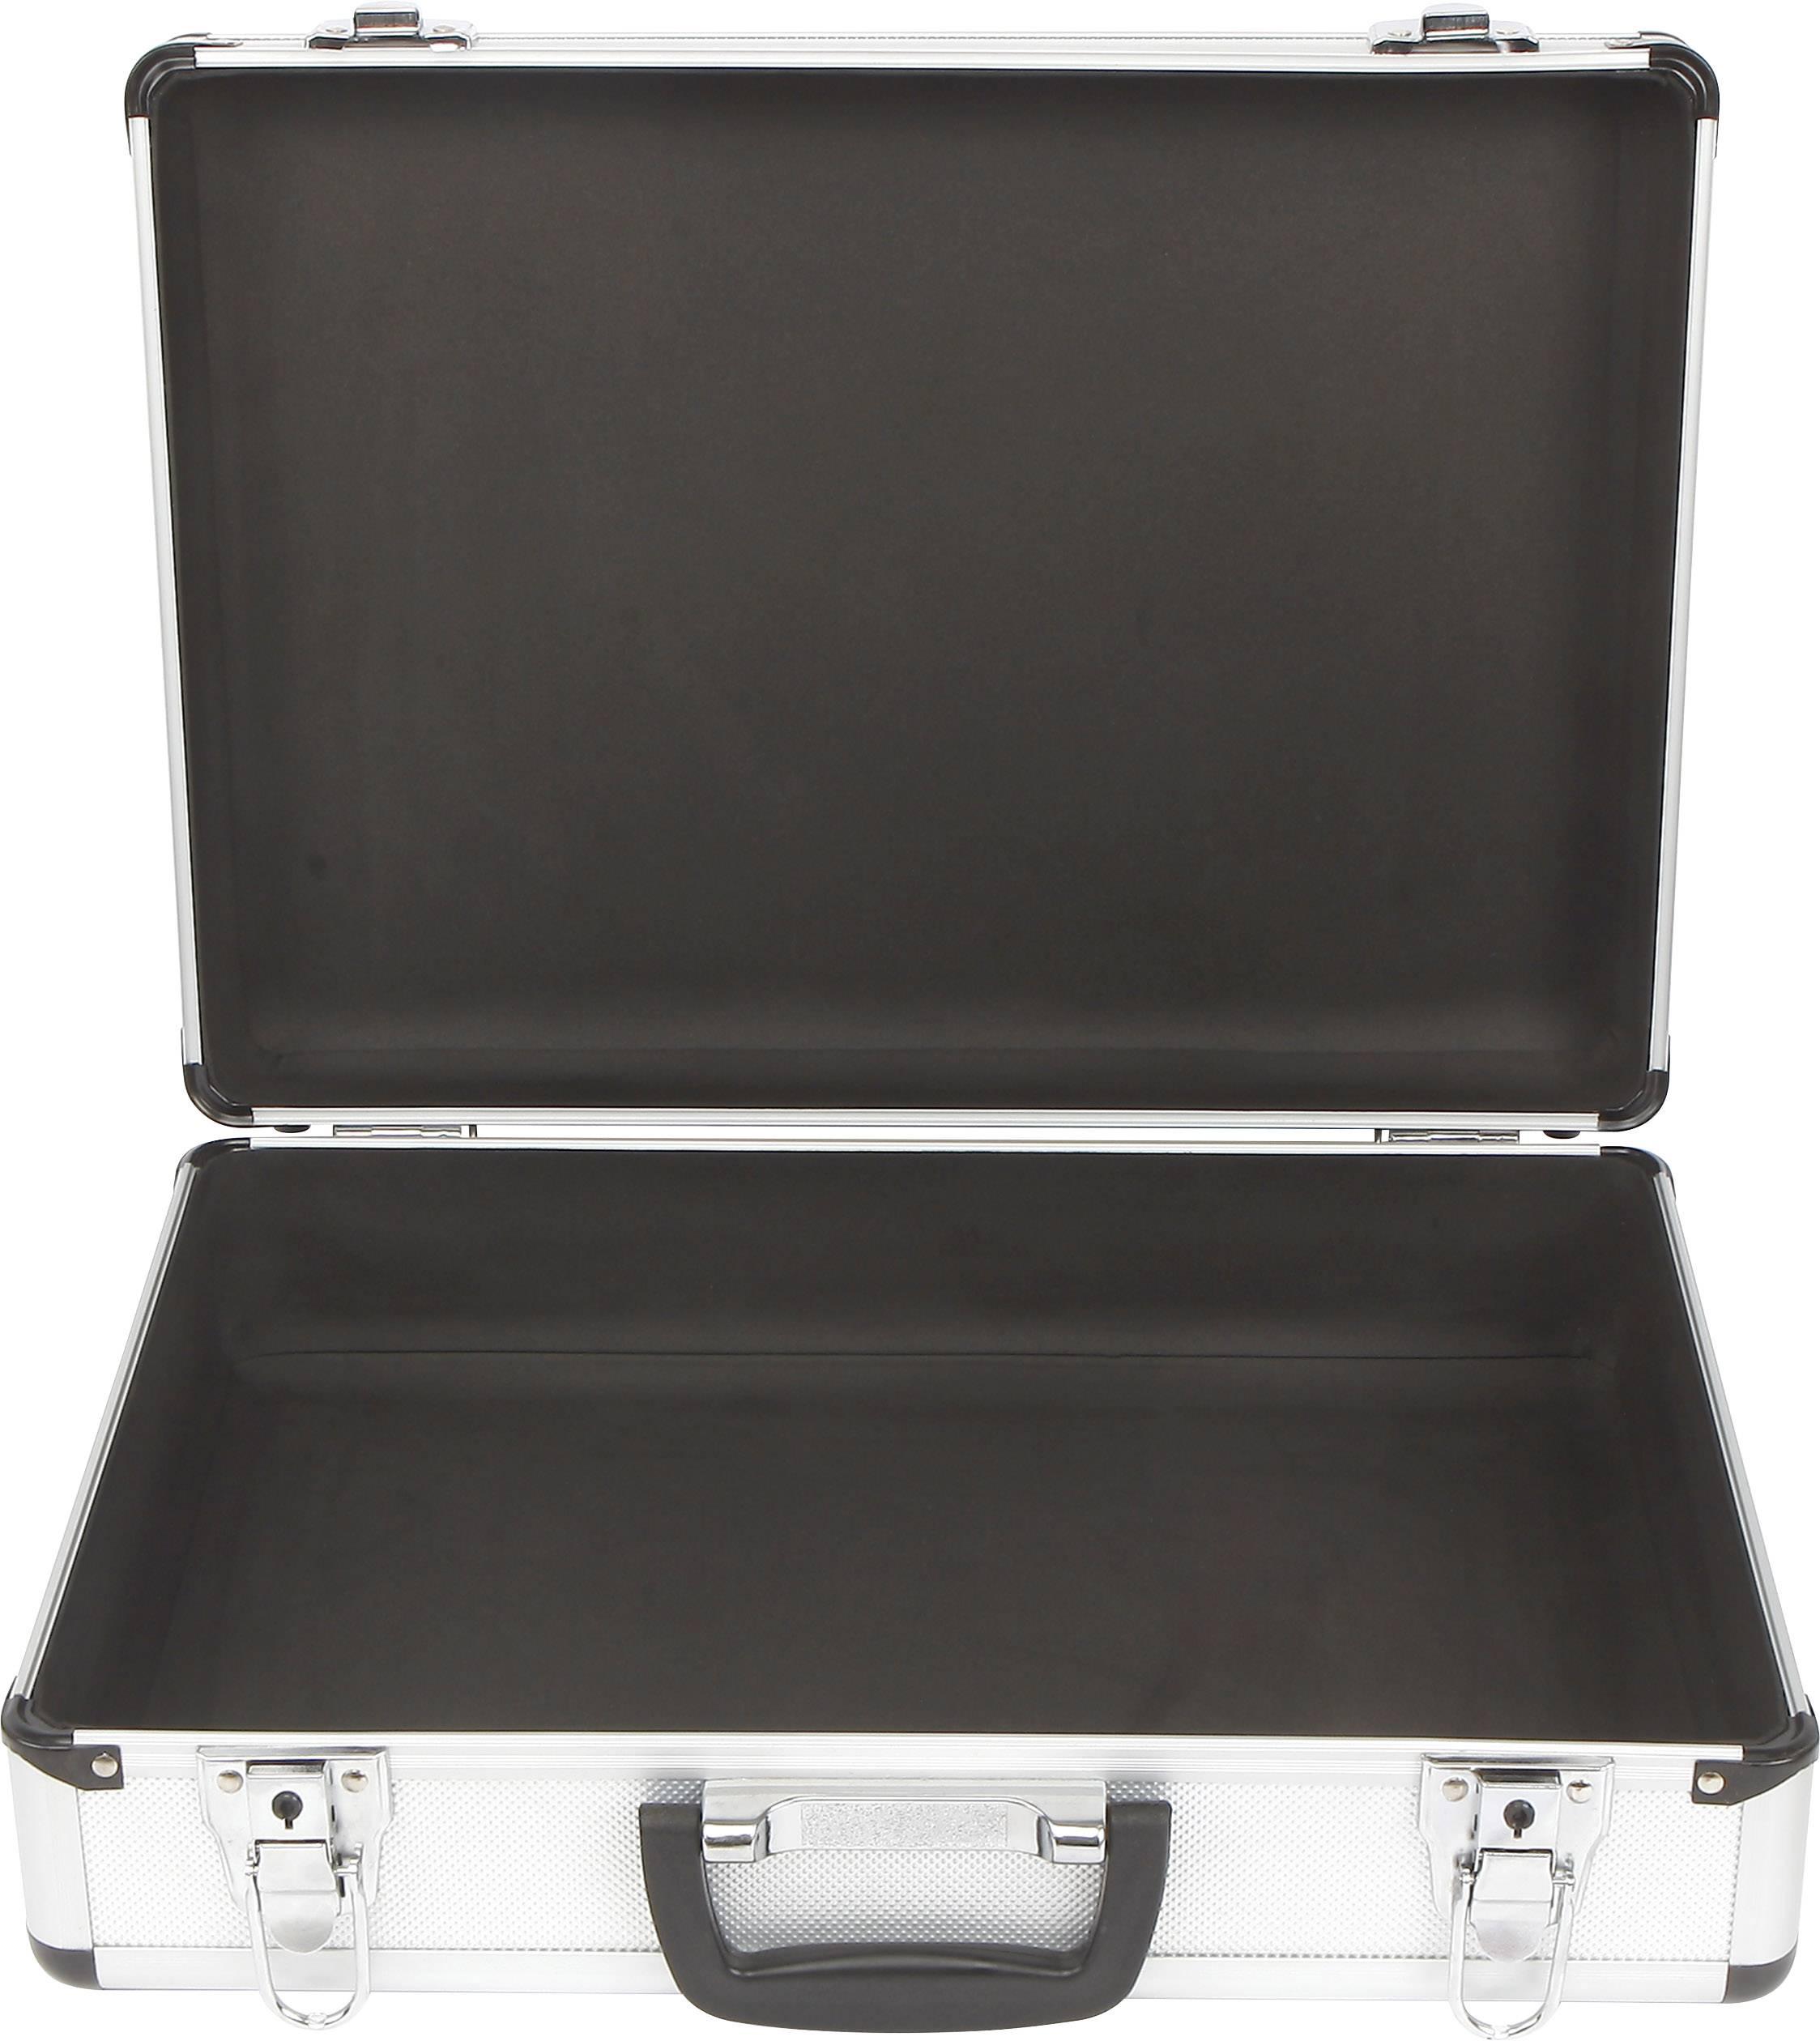 Univerzálny hliníkovy kufrík TOOLCRAFT 1409402, Rozmery: (š x v x h) 428 x 123 x 310 mm